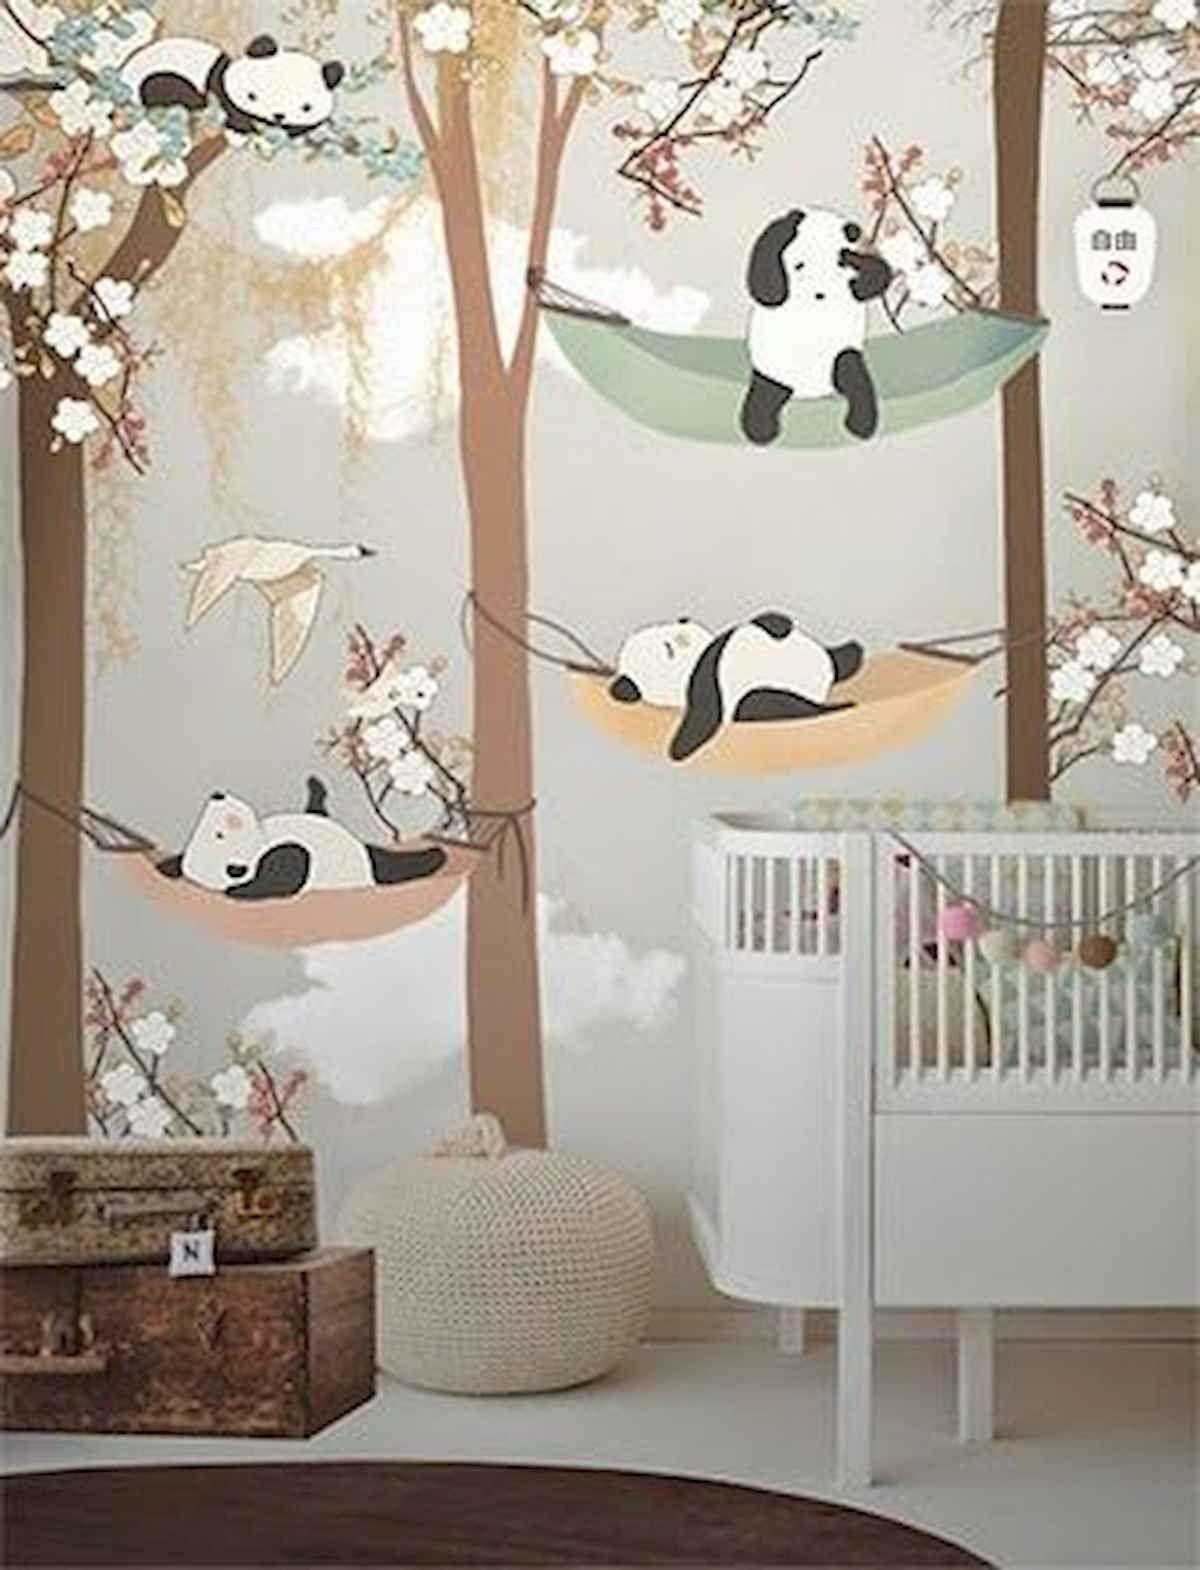 40 Adorable Nursery Room Ideas For Baby Boy Nursery Room 40